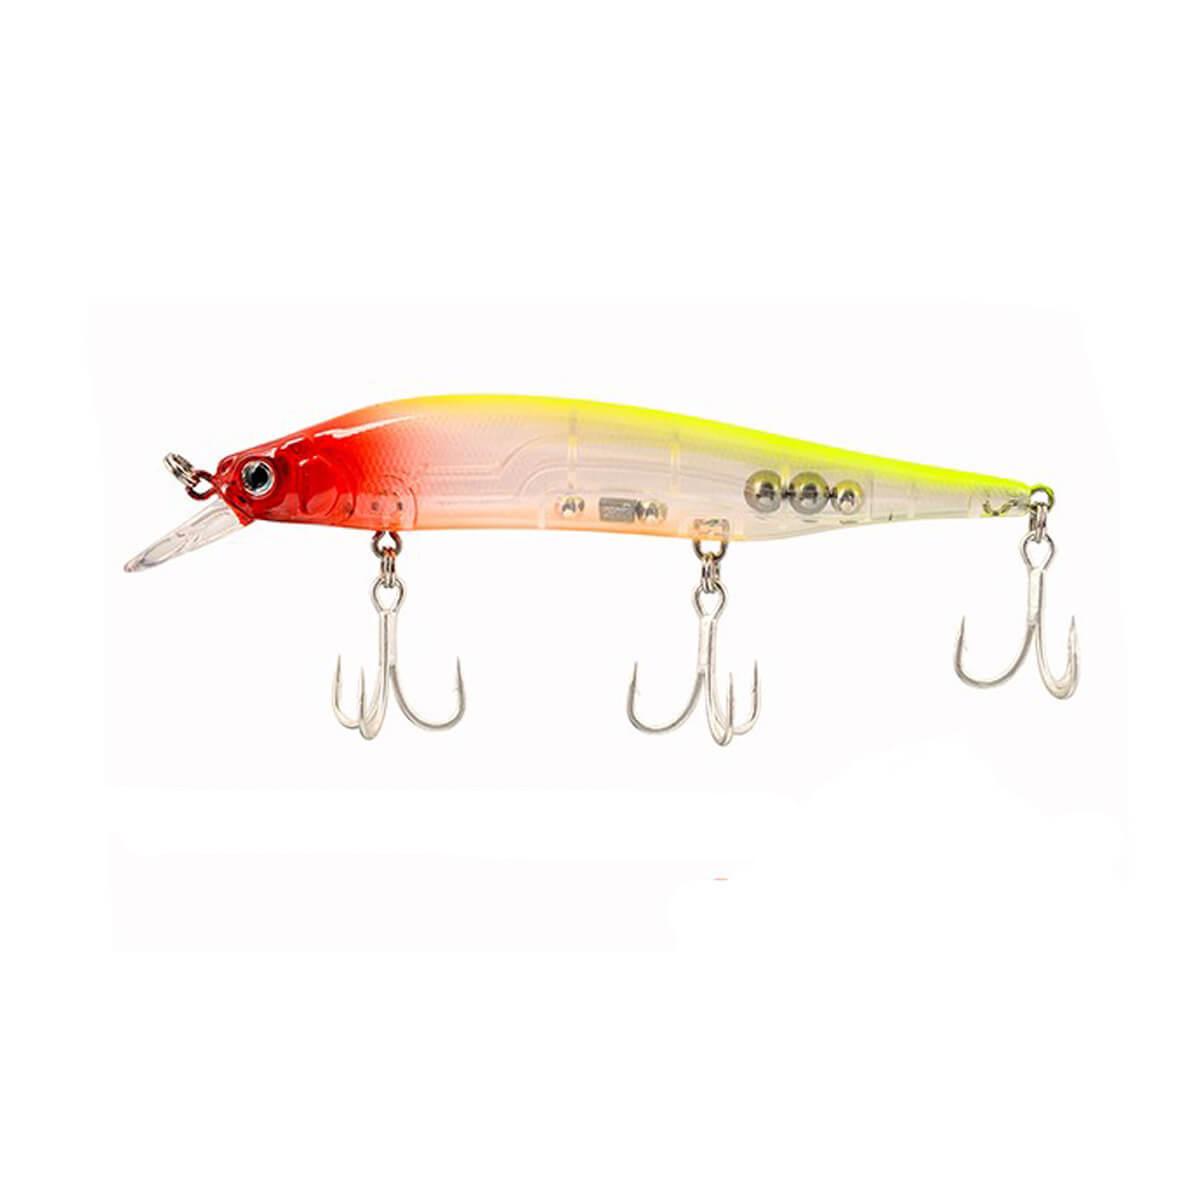 Isca Artificial Nitro Fishing Killer 115  - Pró Pesca Shop